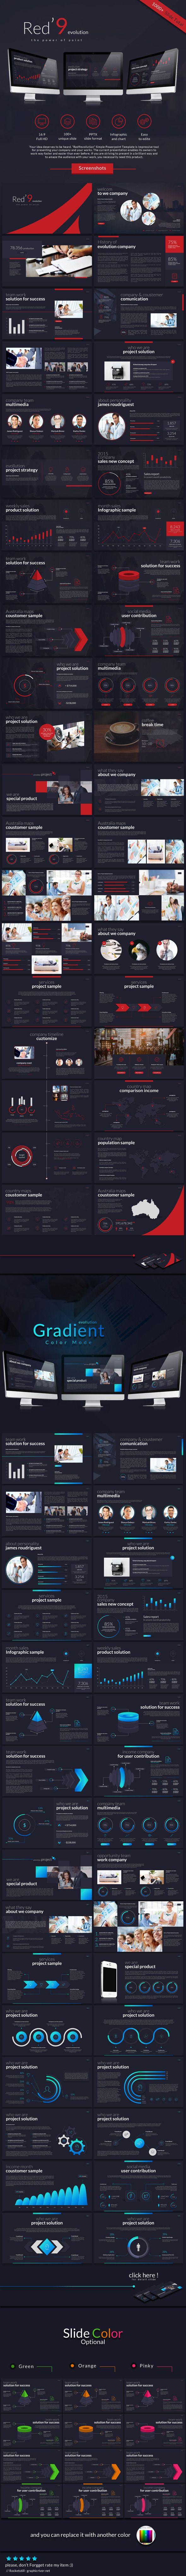 Red'9evolution powerpoint Template Presentation Template #design #slides Download: http://graphicriver.net/item/red9evolution-powerpoint/11447576?ref=ksioks